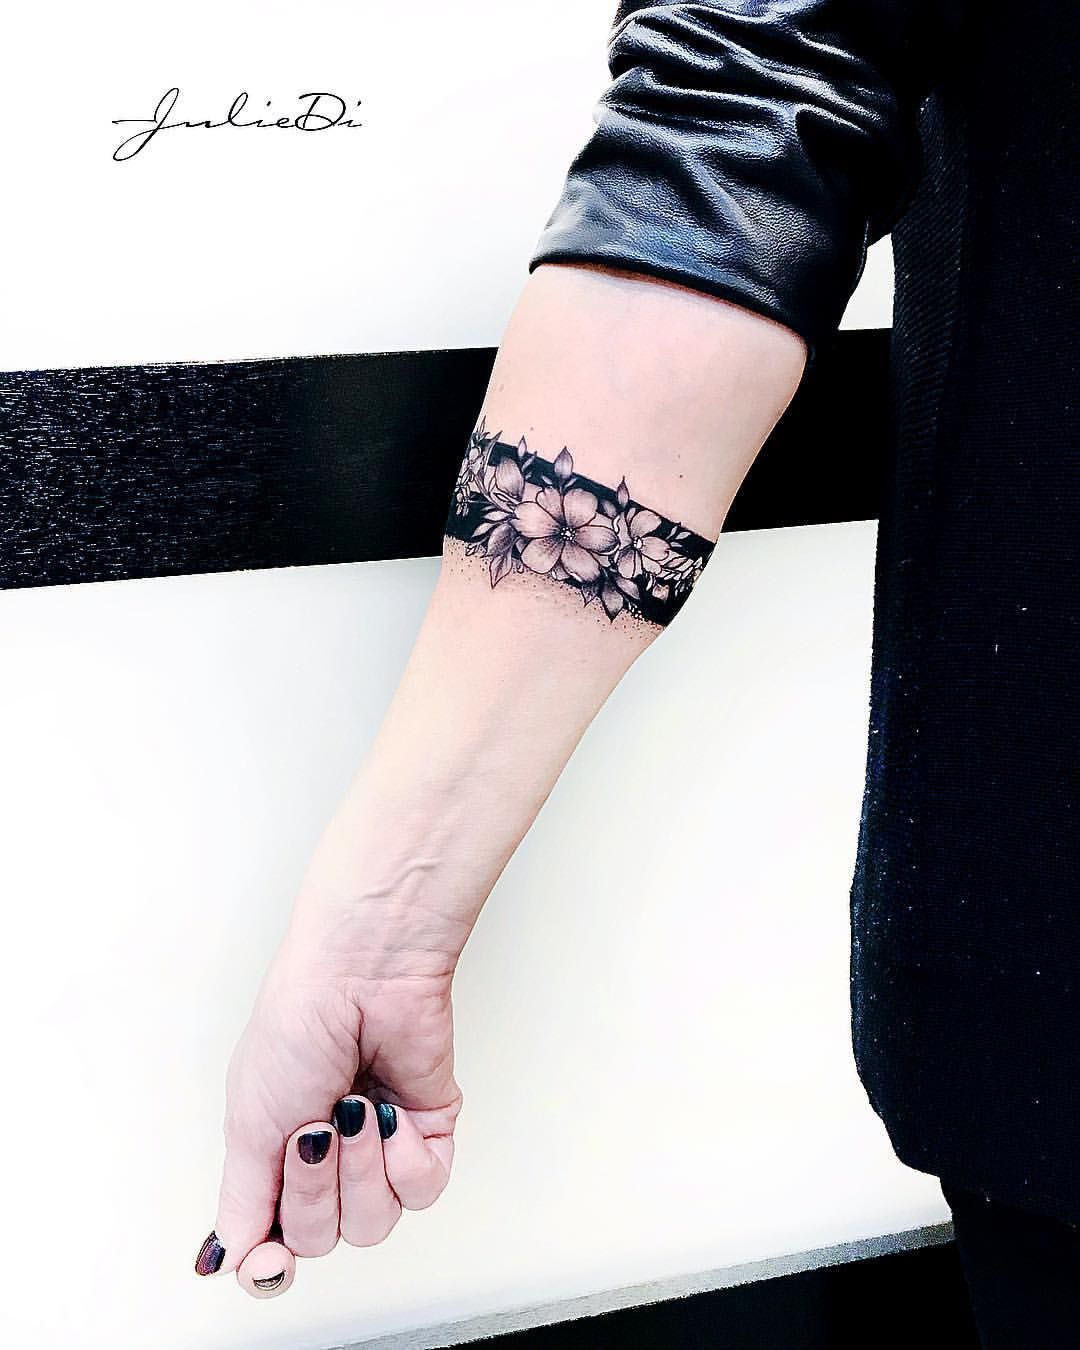 браслет для @savetlana  🖤 @kolibrisalon ✔️ @juliedi  ✔️ @tattoojuliedi ✔️                     свежая воспаленная тату… is part of Tattoos -